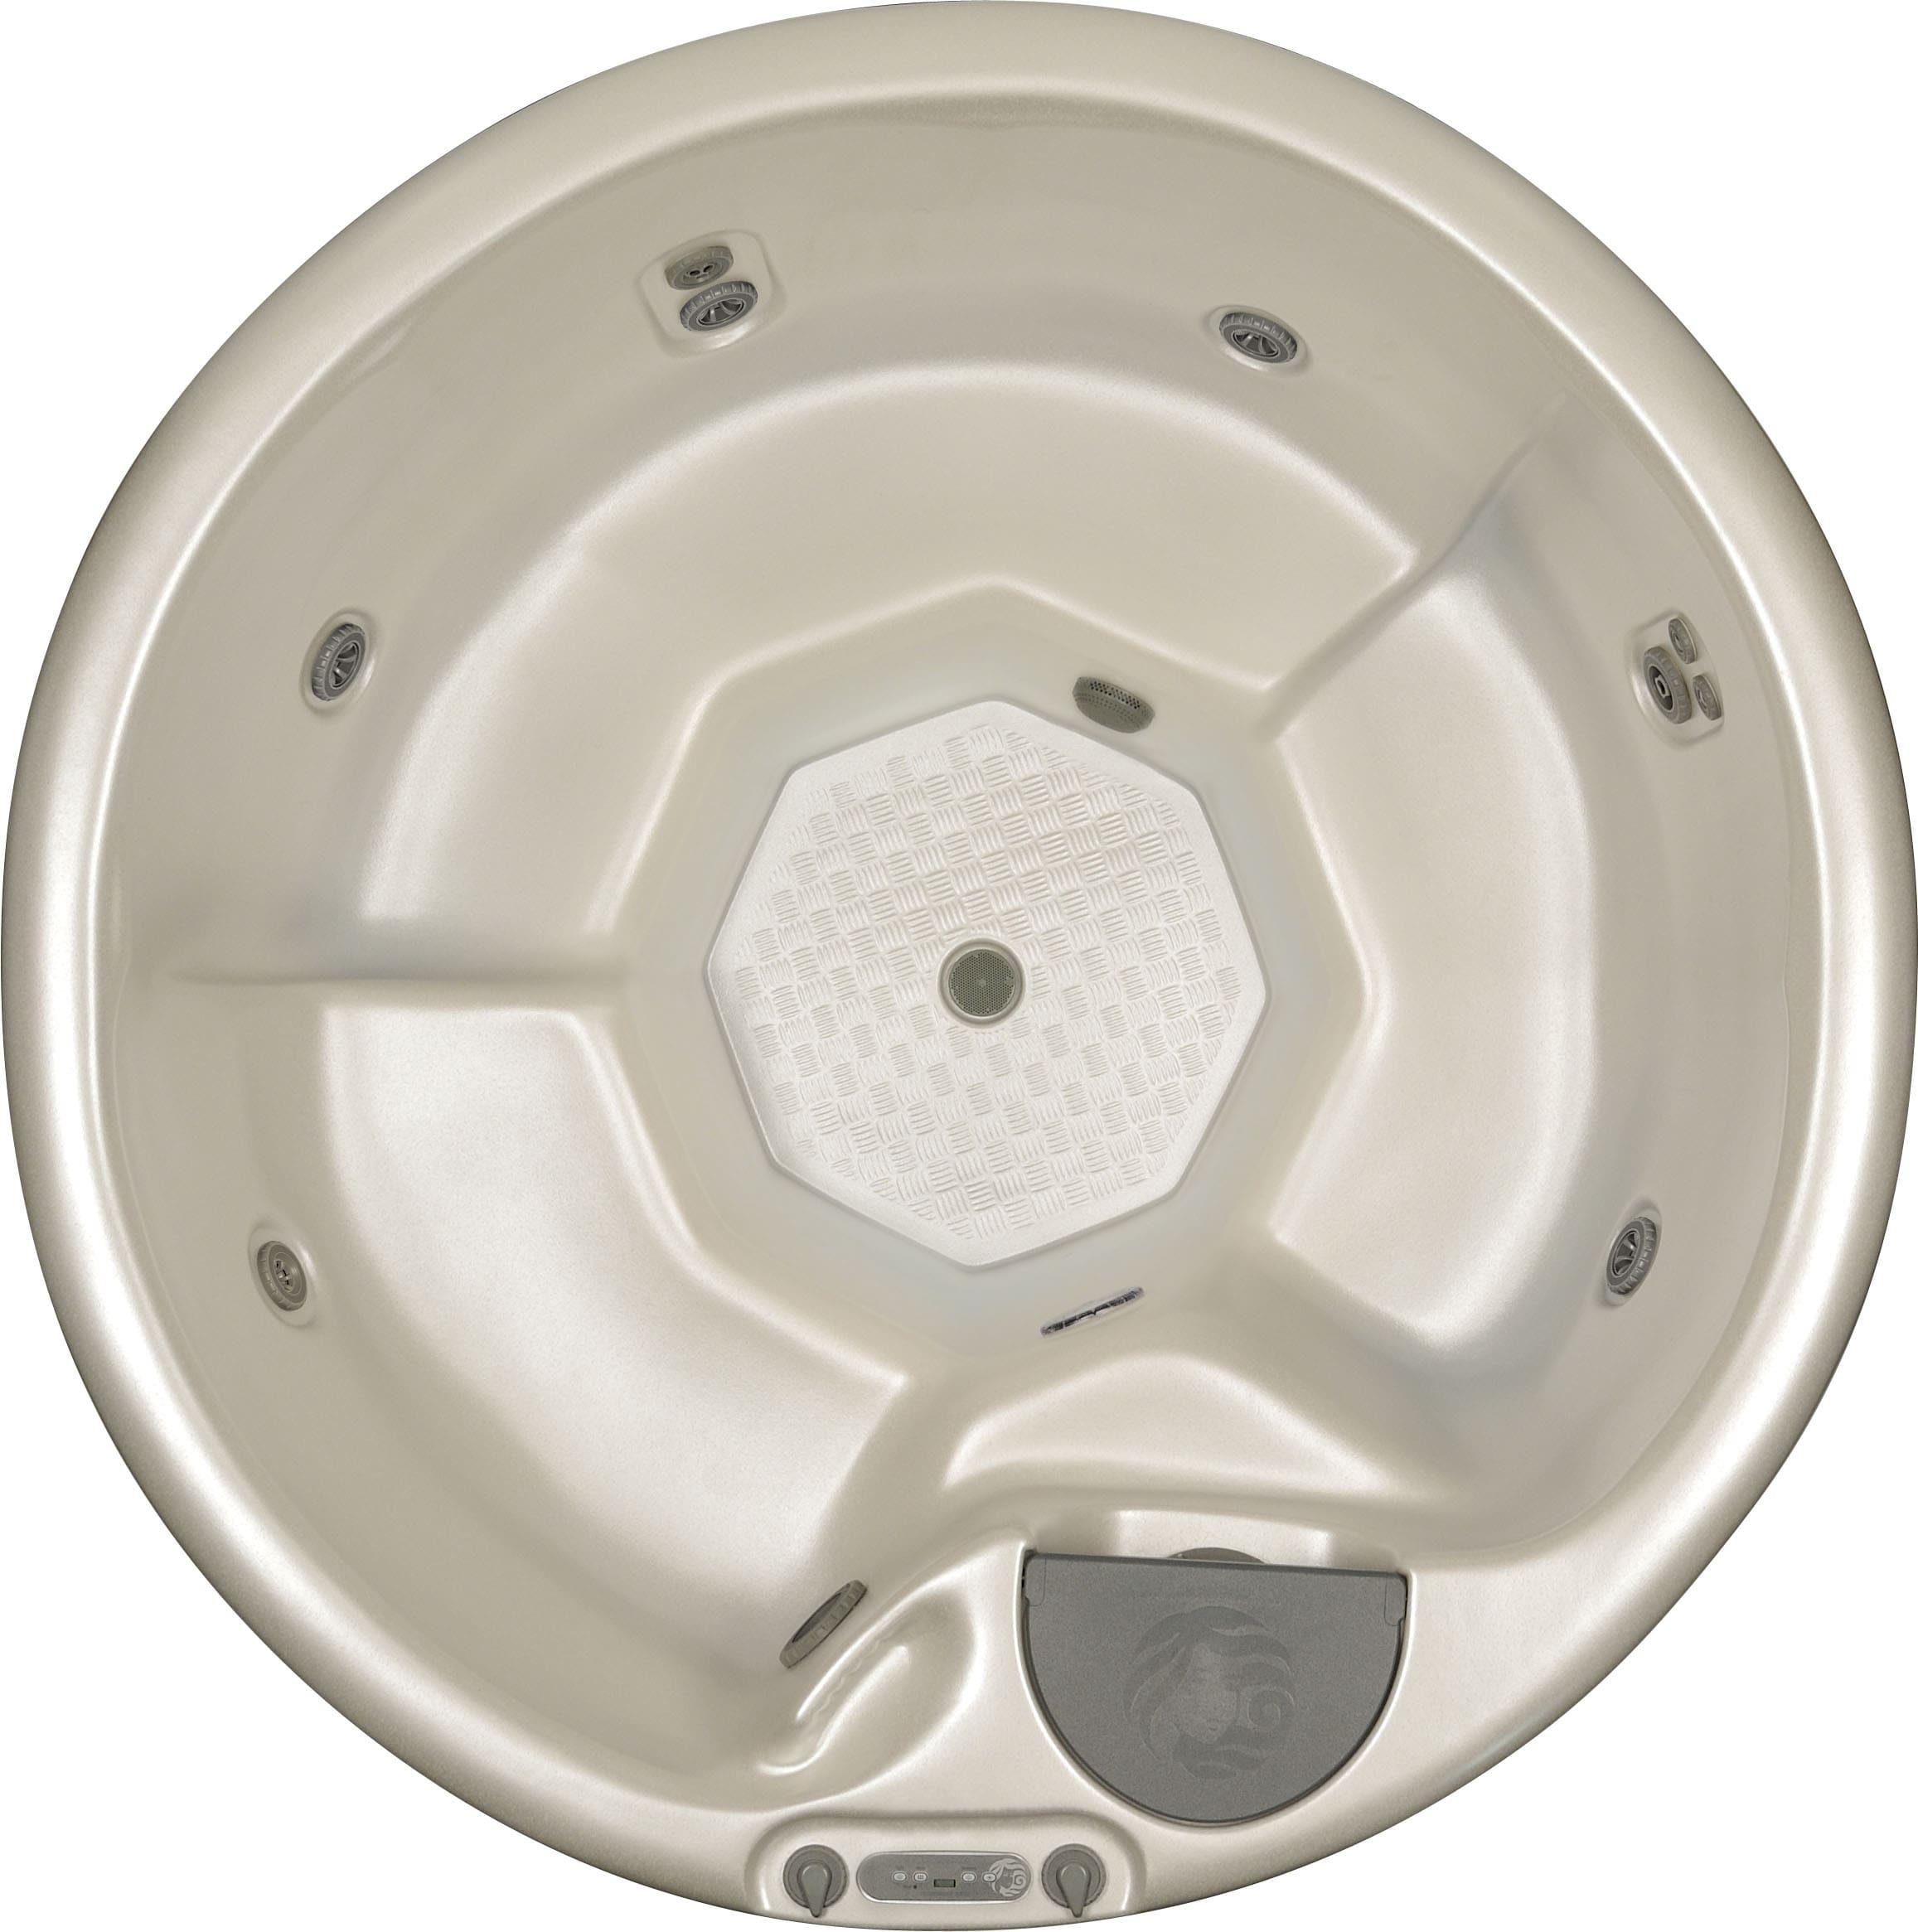 Circular hot tub